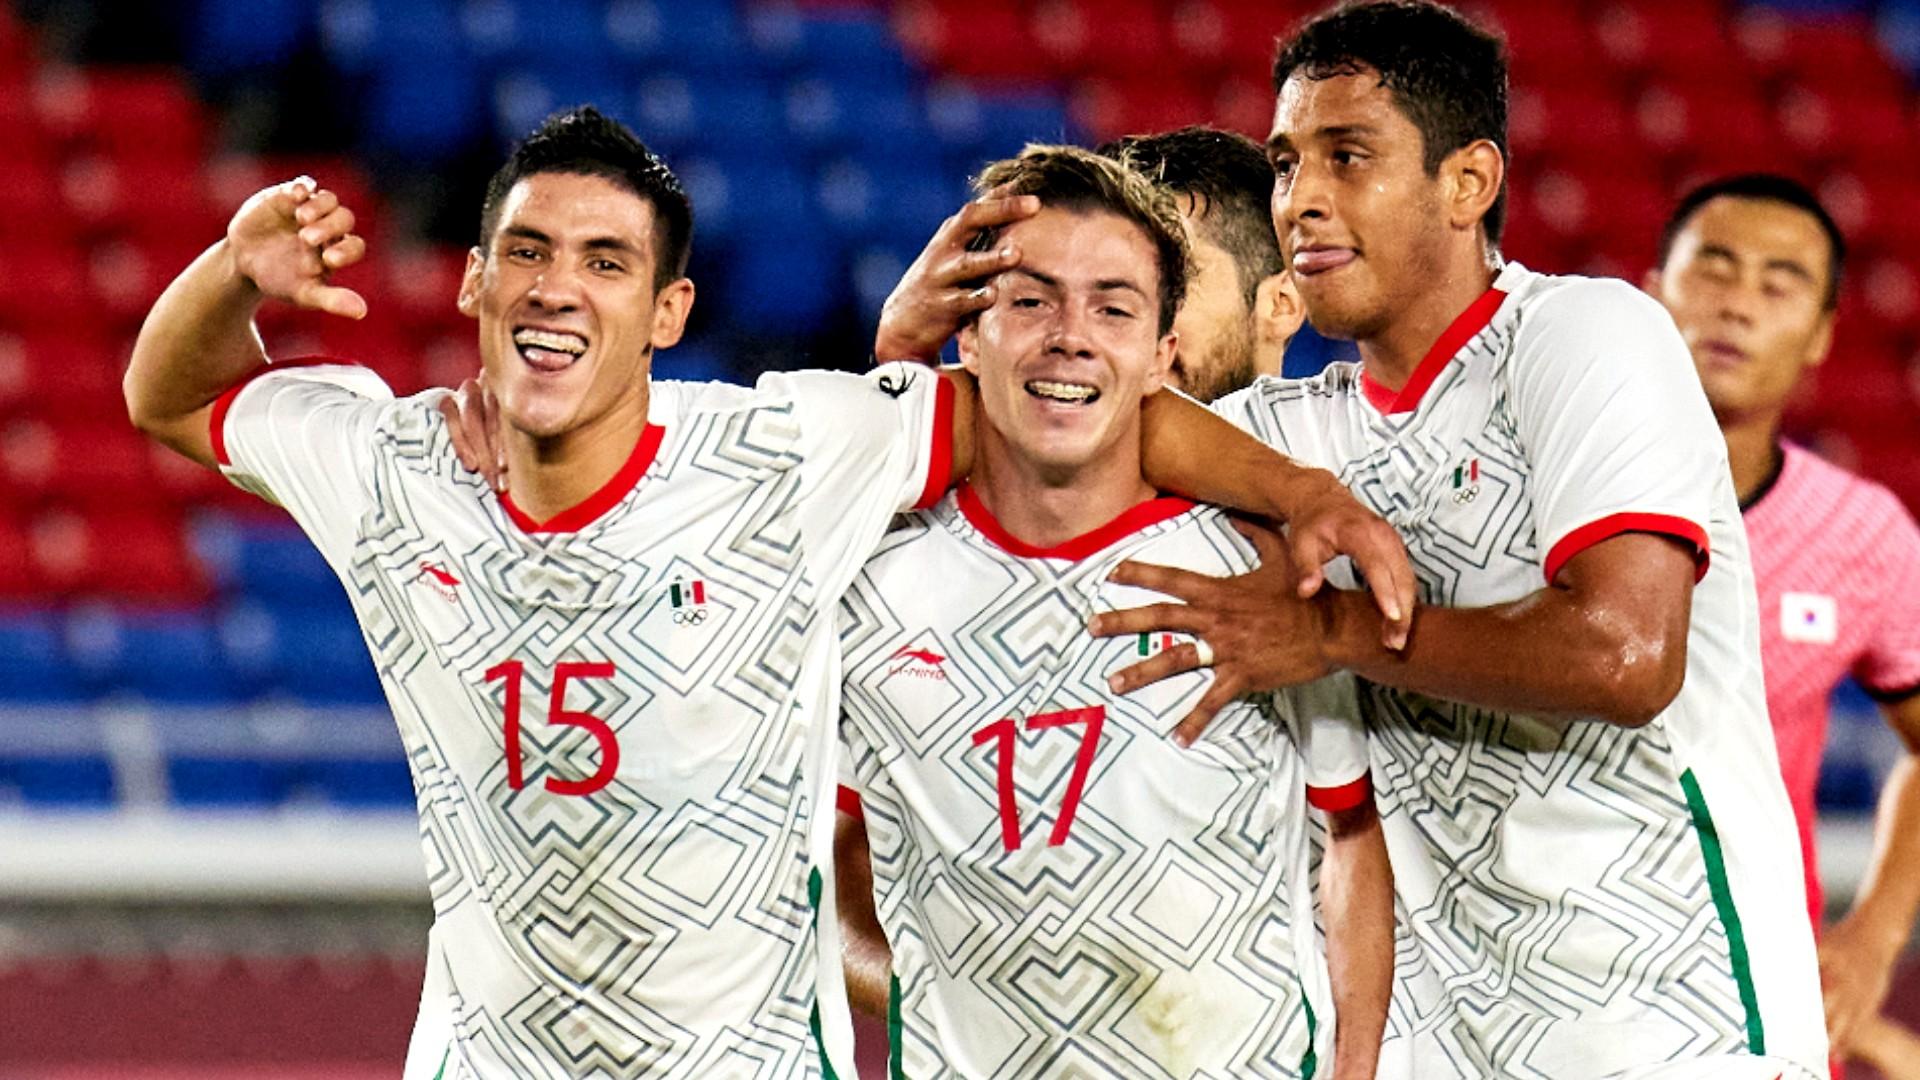 Mexico-2021-olympics-soccer_bfibkt2uvcbx1xof0u1xakgfq